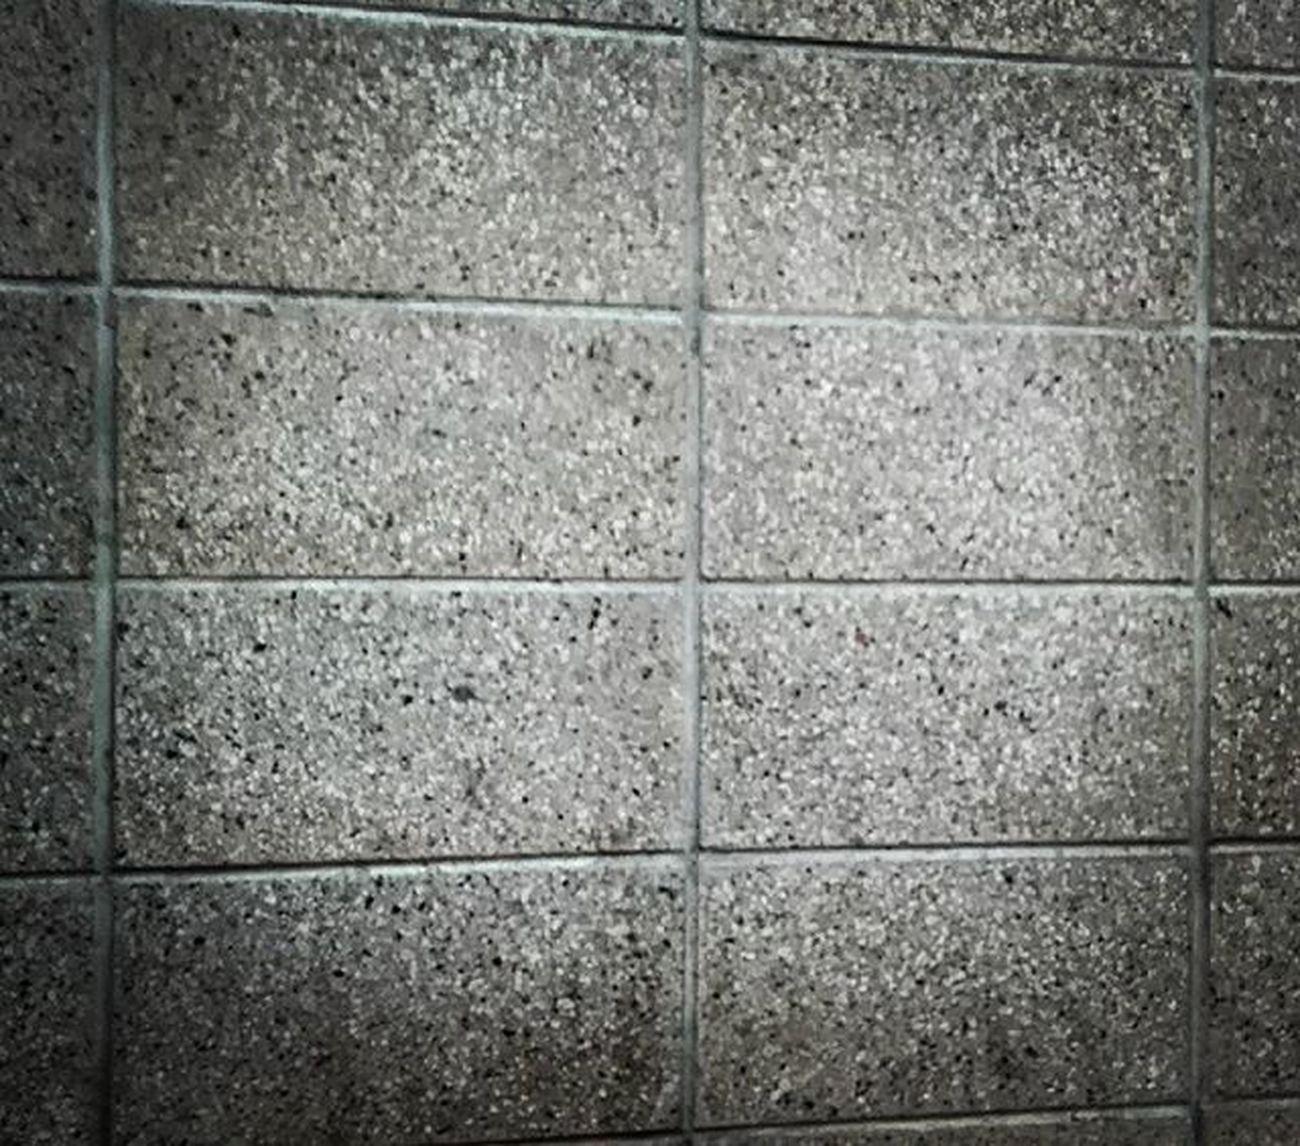 Texture Brick Grey Wall Dannevirke NZ Newzealand Aotearoa Headinghome Mcdonalds Ss_bw_20